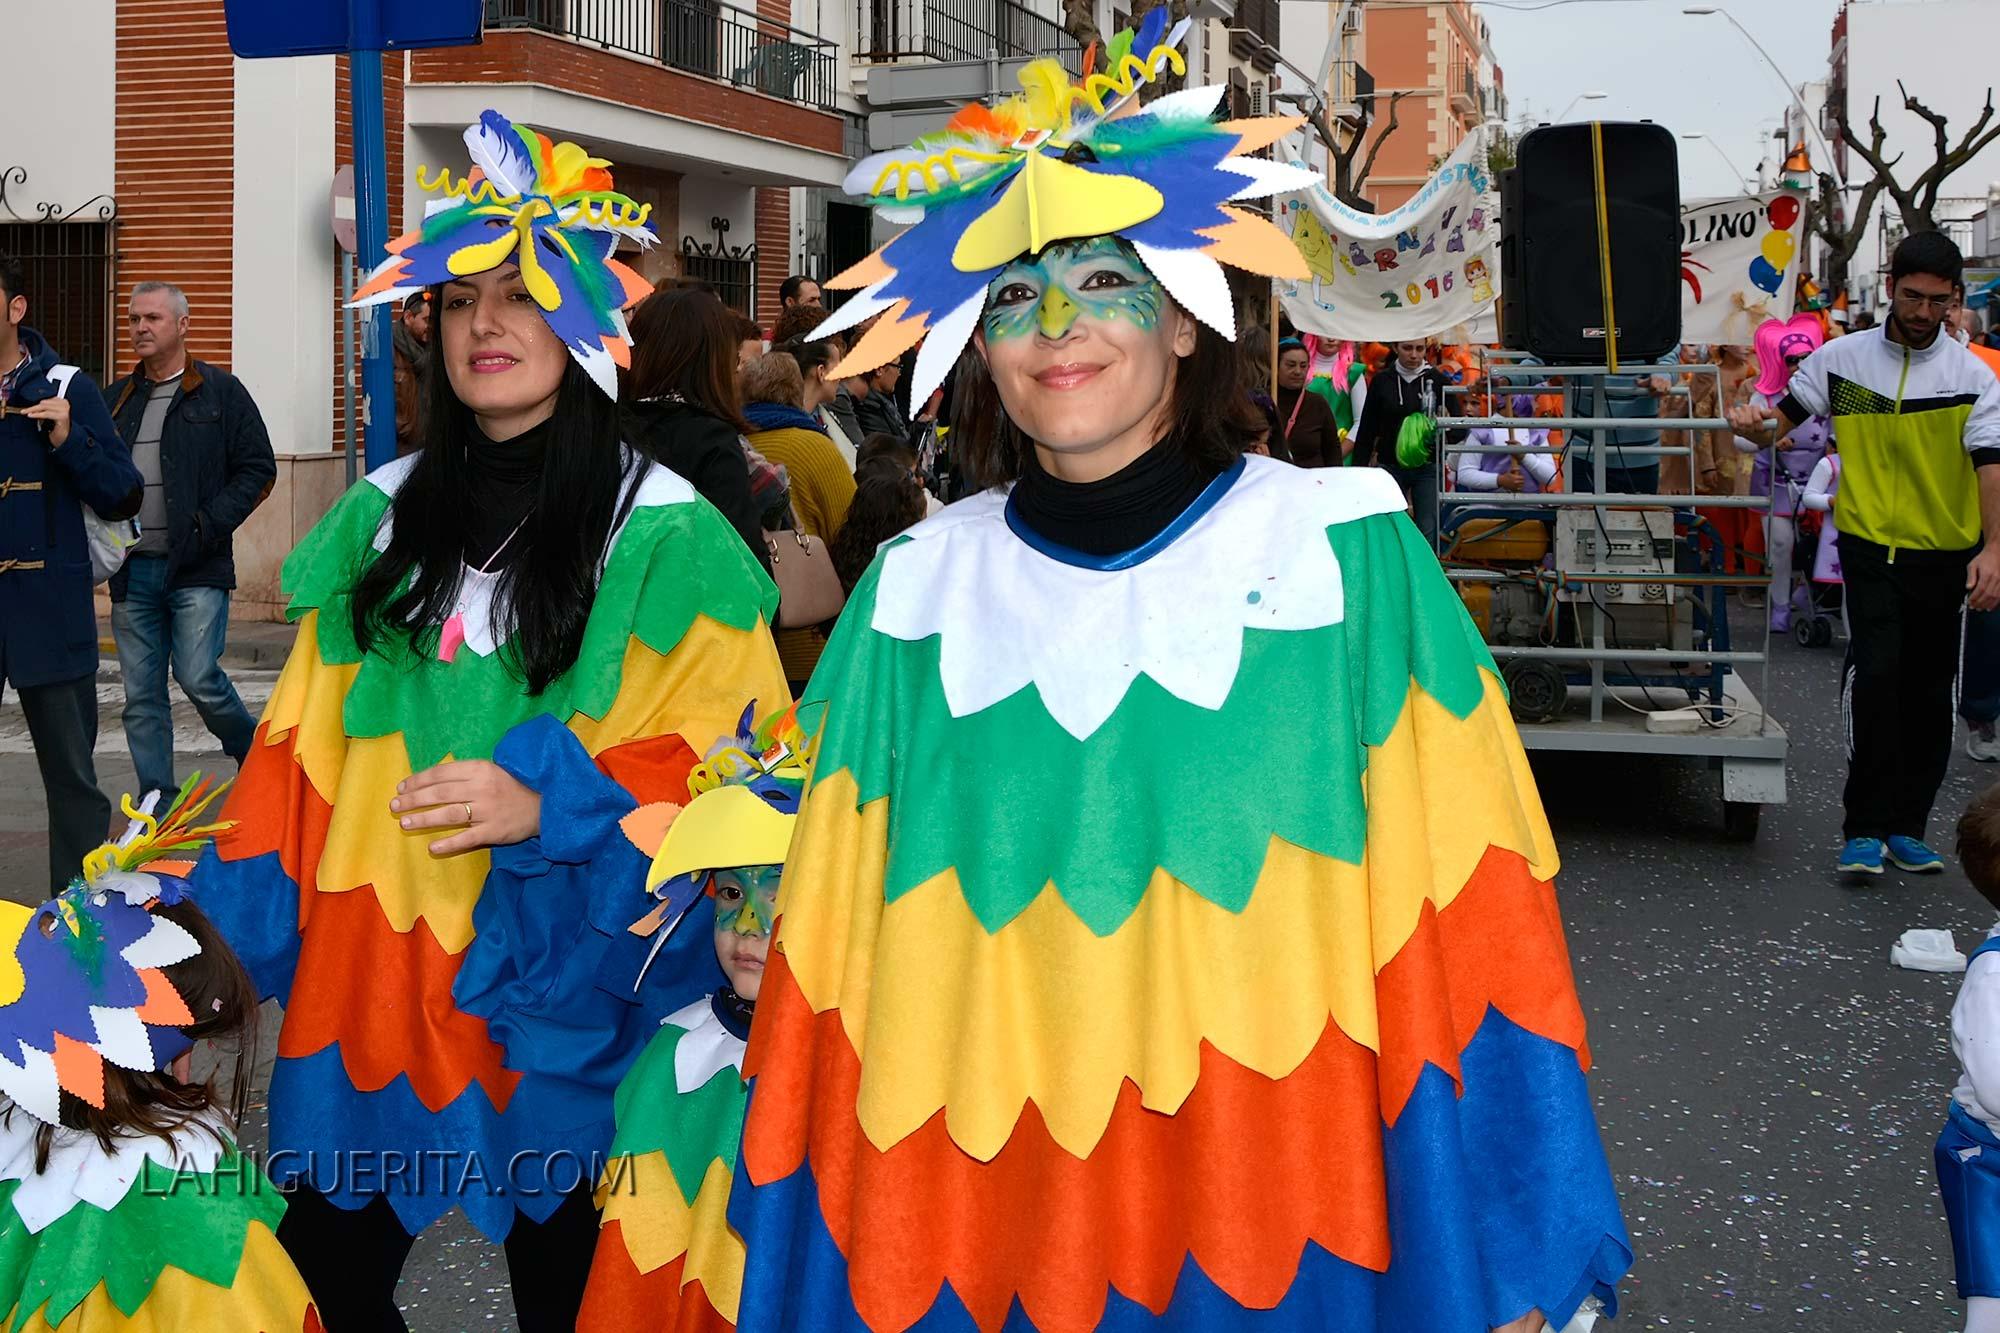 Cabalgata infantil carnaval isla cristina _DSC8291